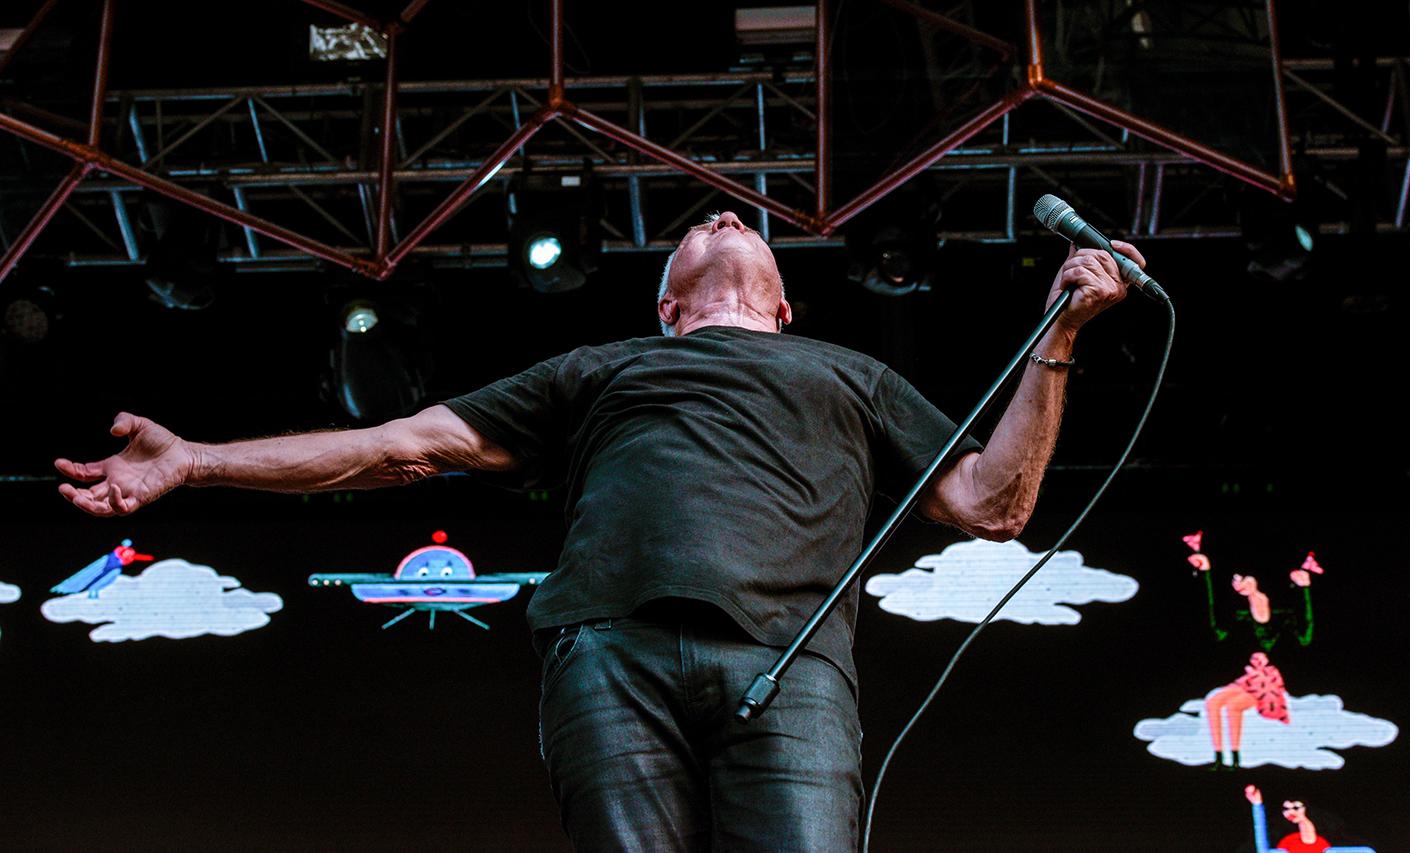 live review falls festival byron bay photo credit dominique berns blackwell savage thrills savagethrills 17